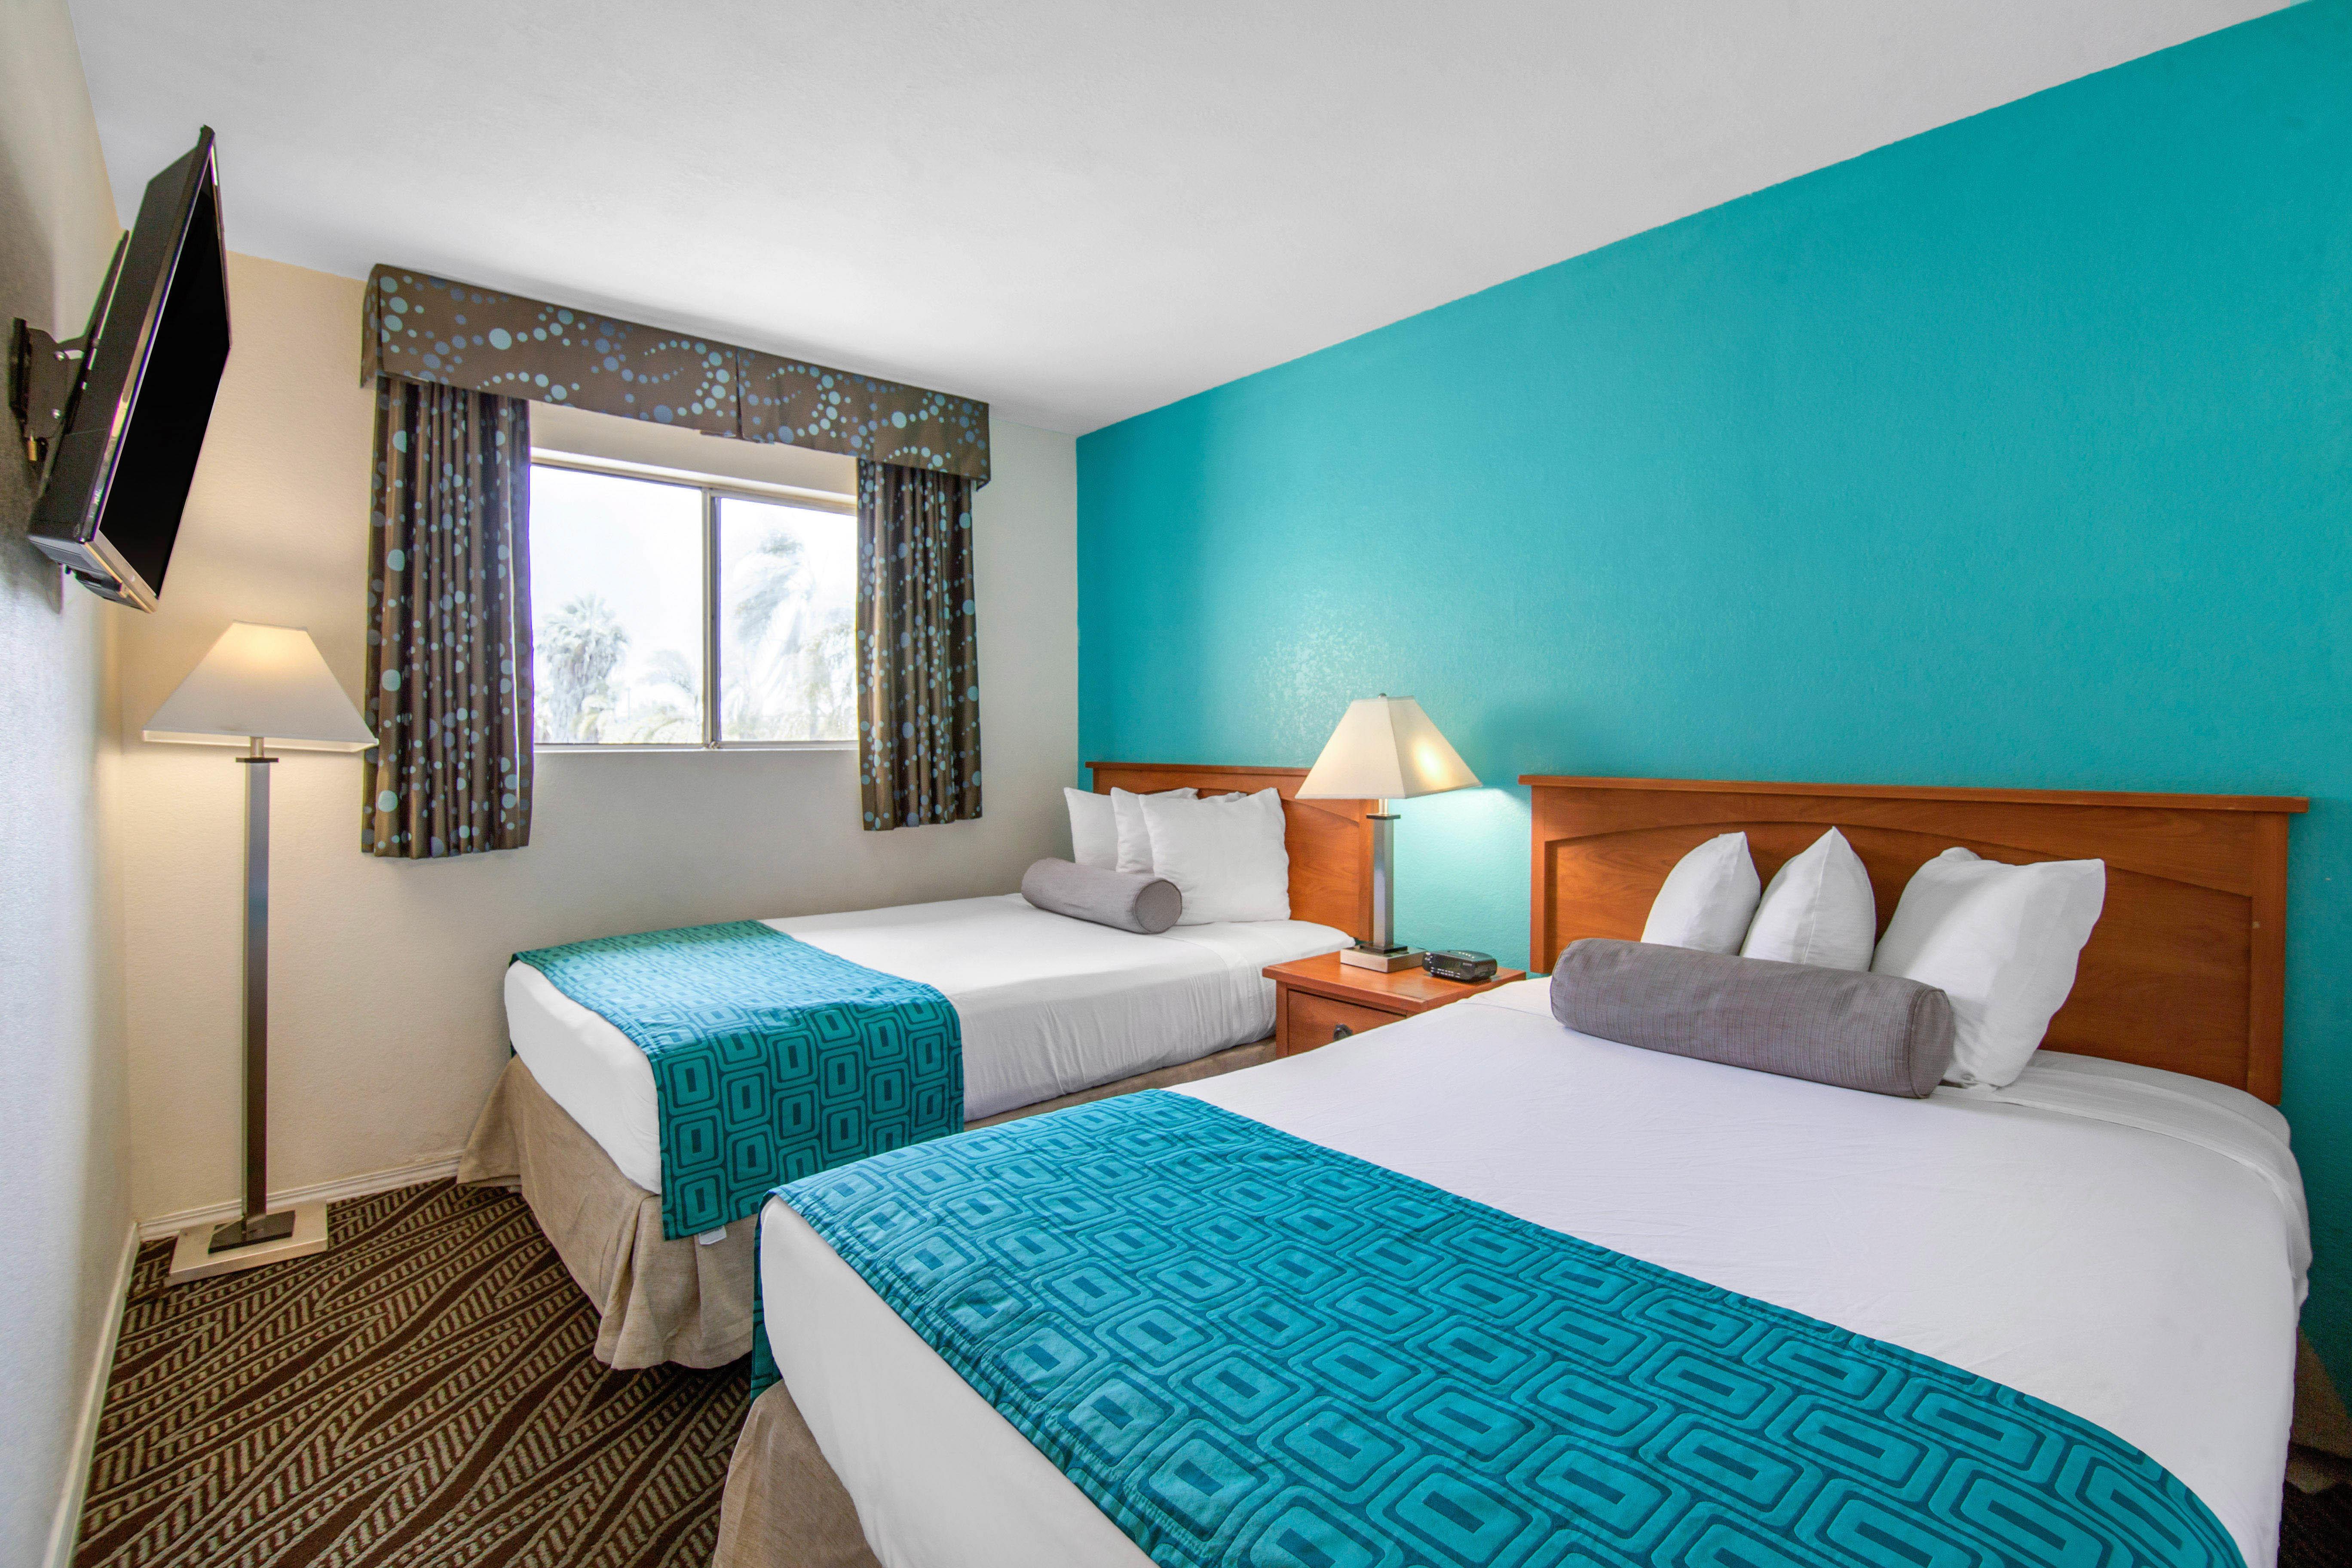 Howard Johnson by Wyndham Chula Vista San Diego Suite Hotel image 14